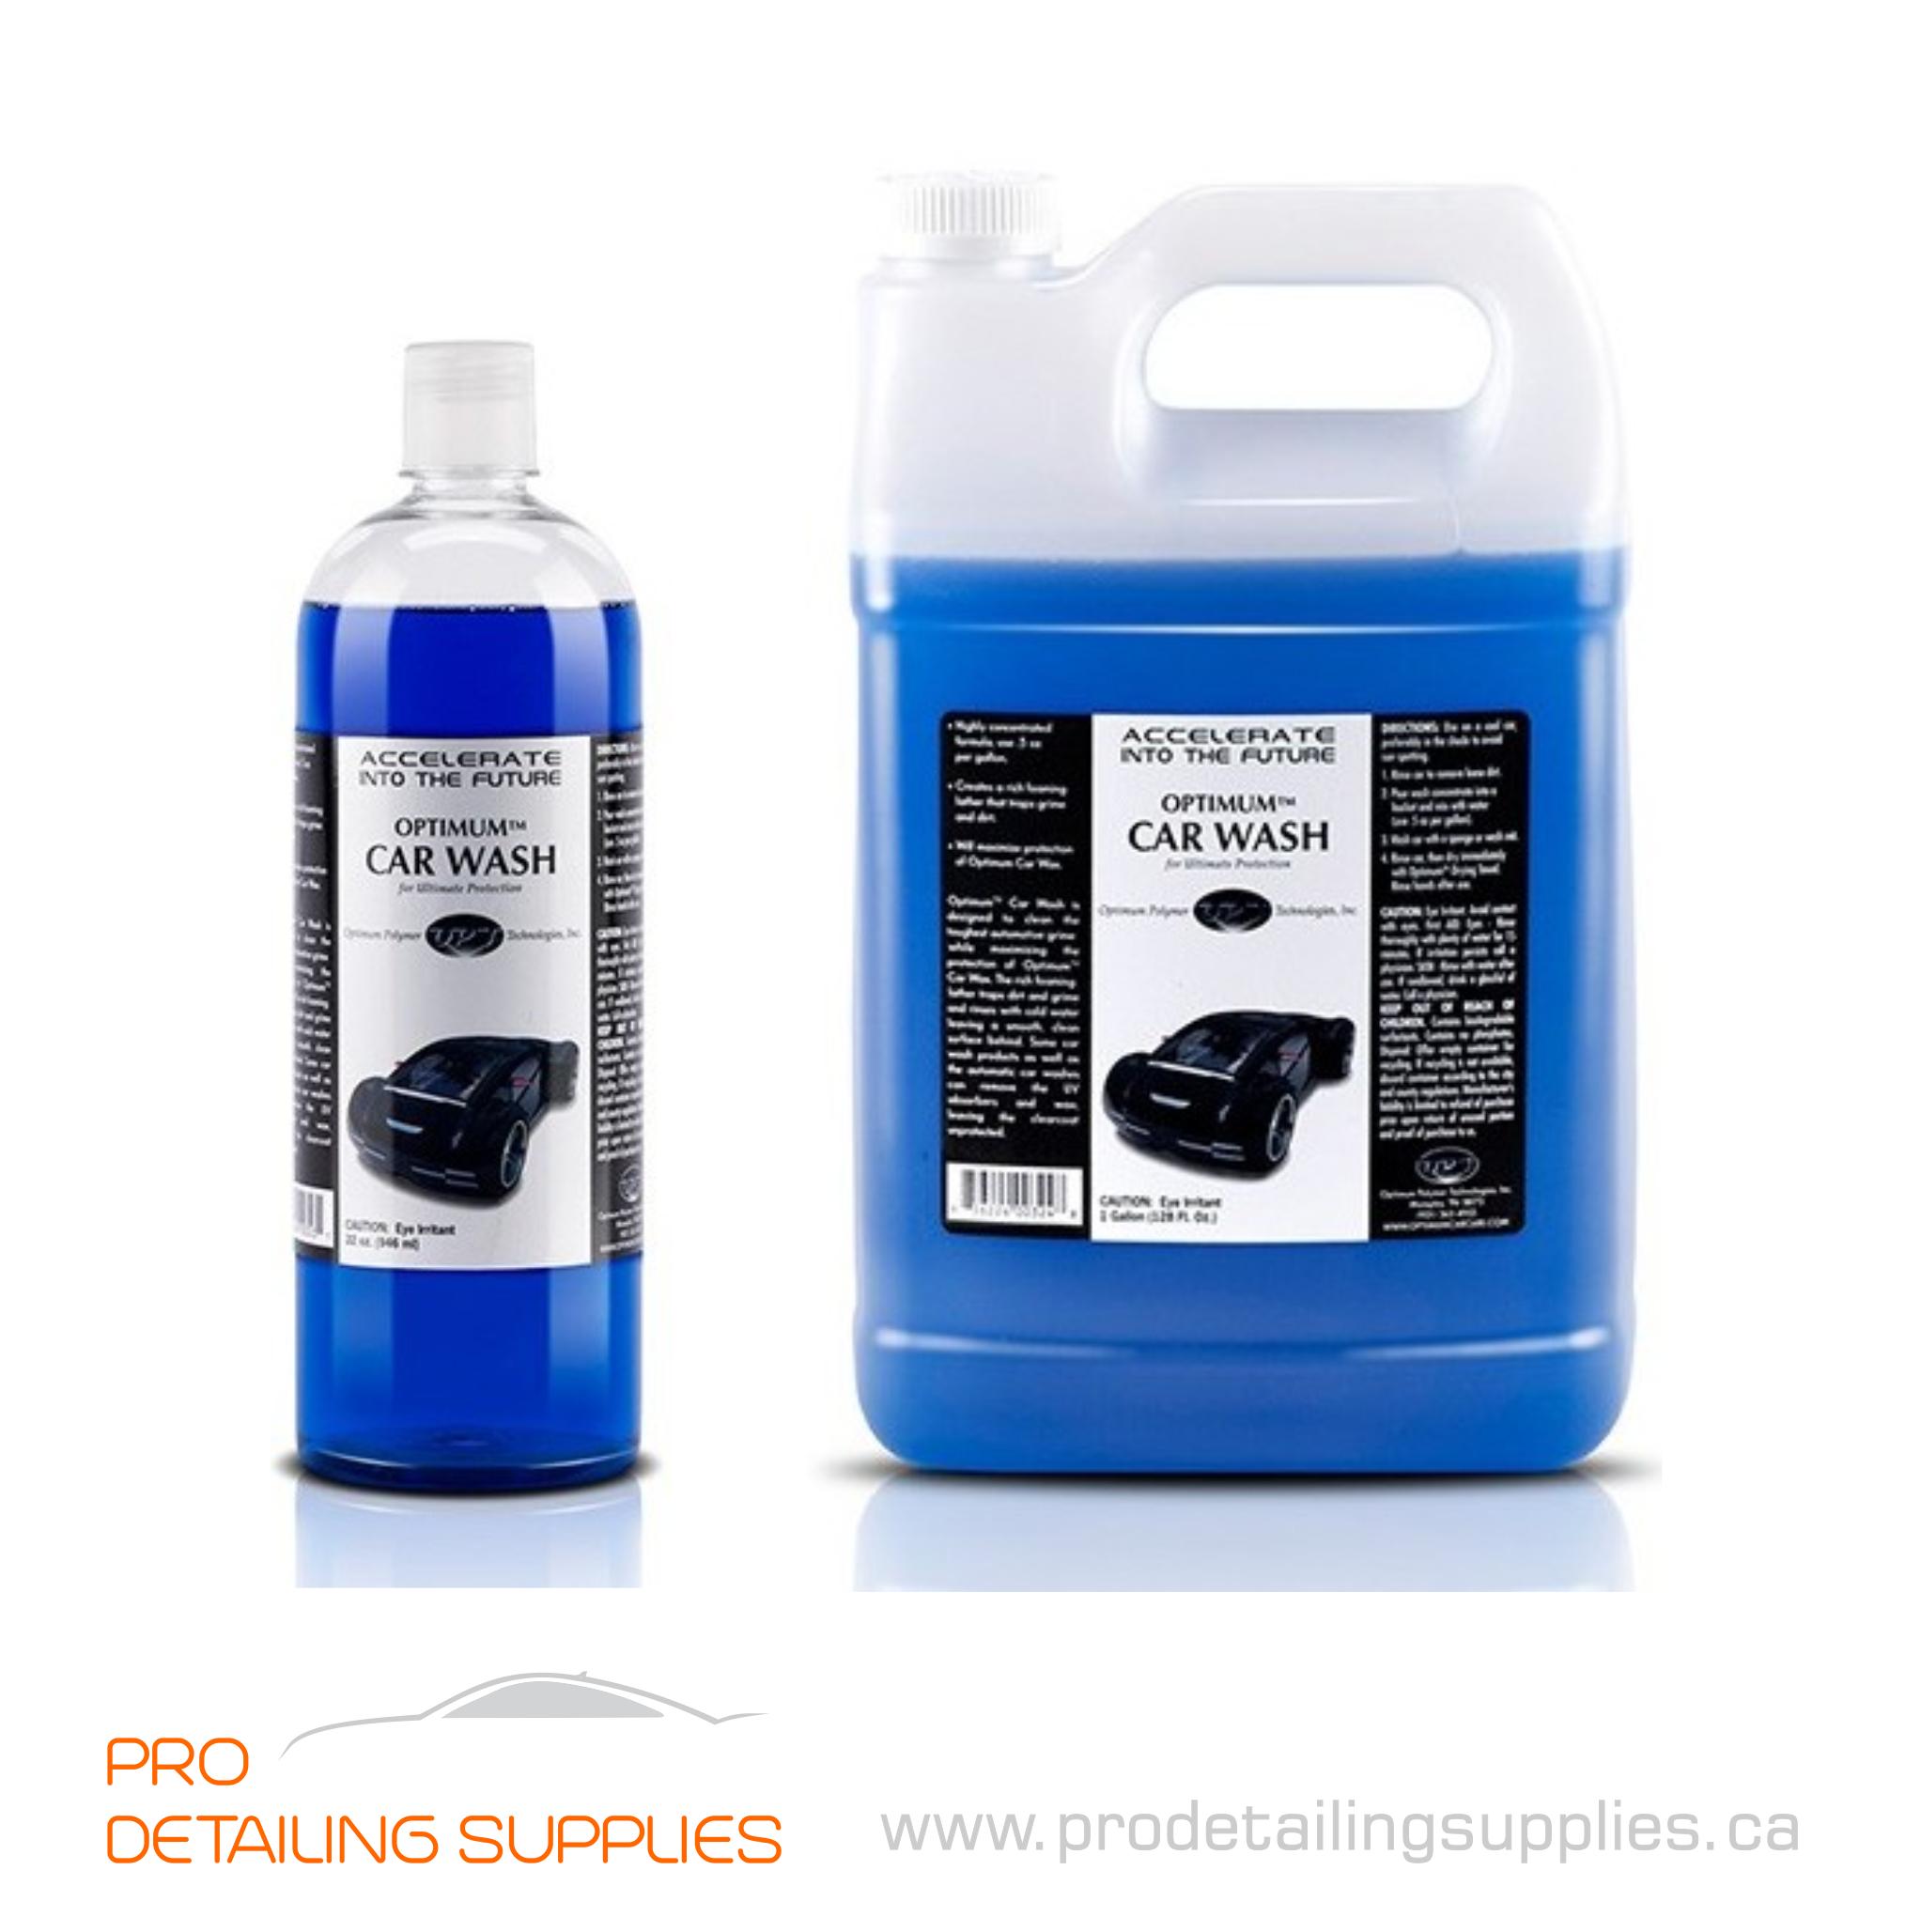 Optimum Car Wash Prodetailingsupplies